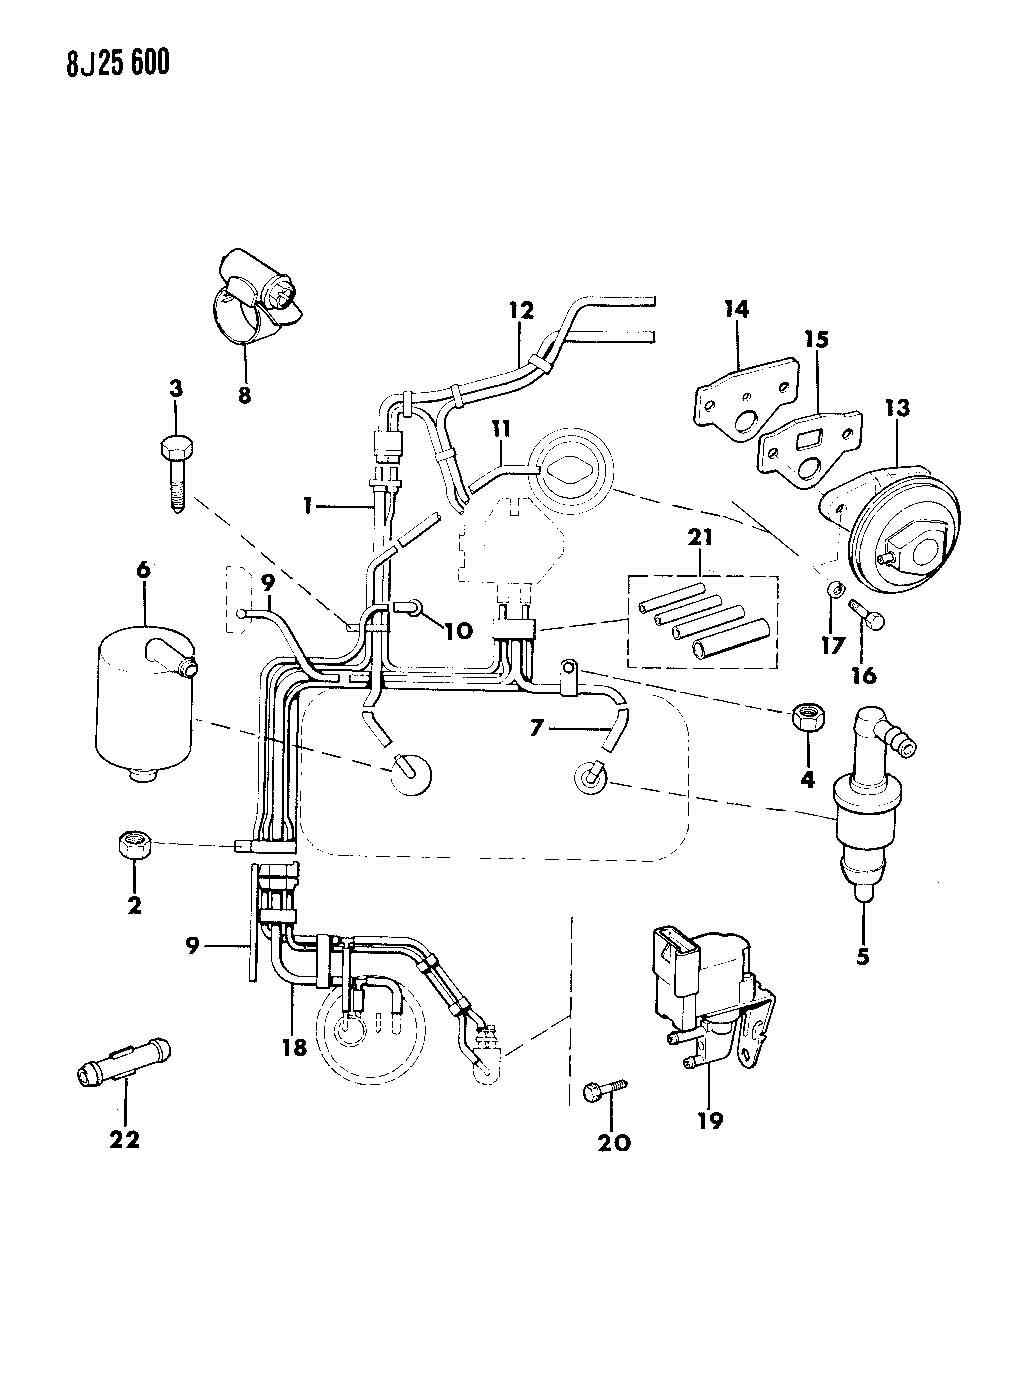 1987 jeep wrangler 4 2 vacuum diagram  jeep  auto fuse box